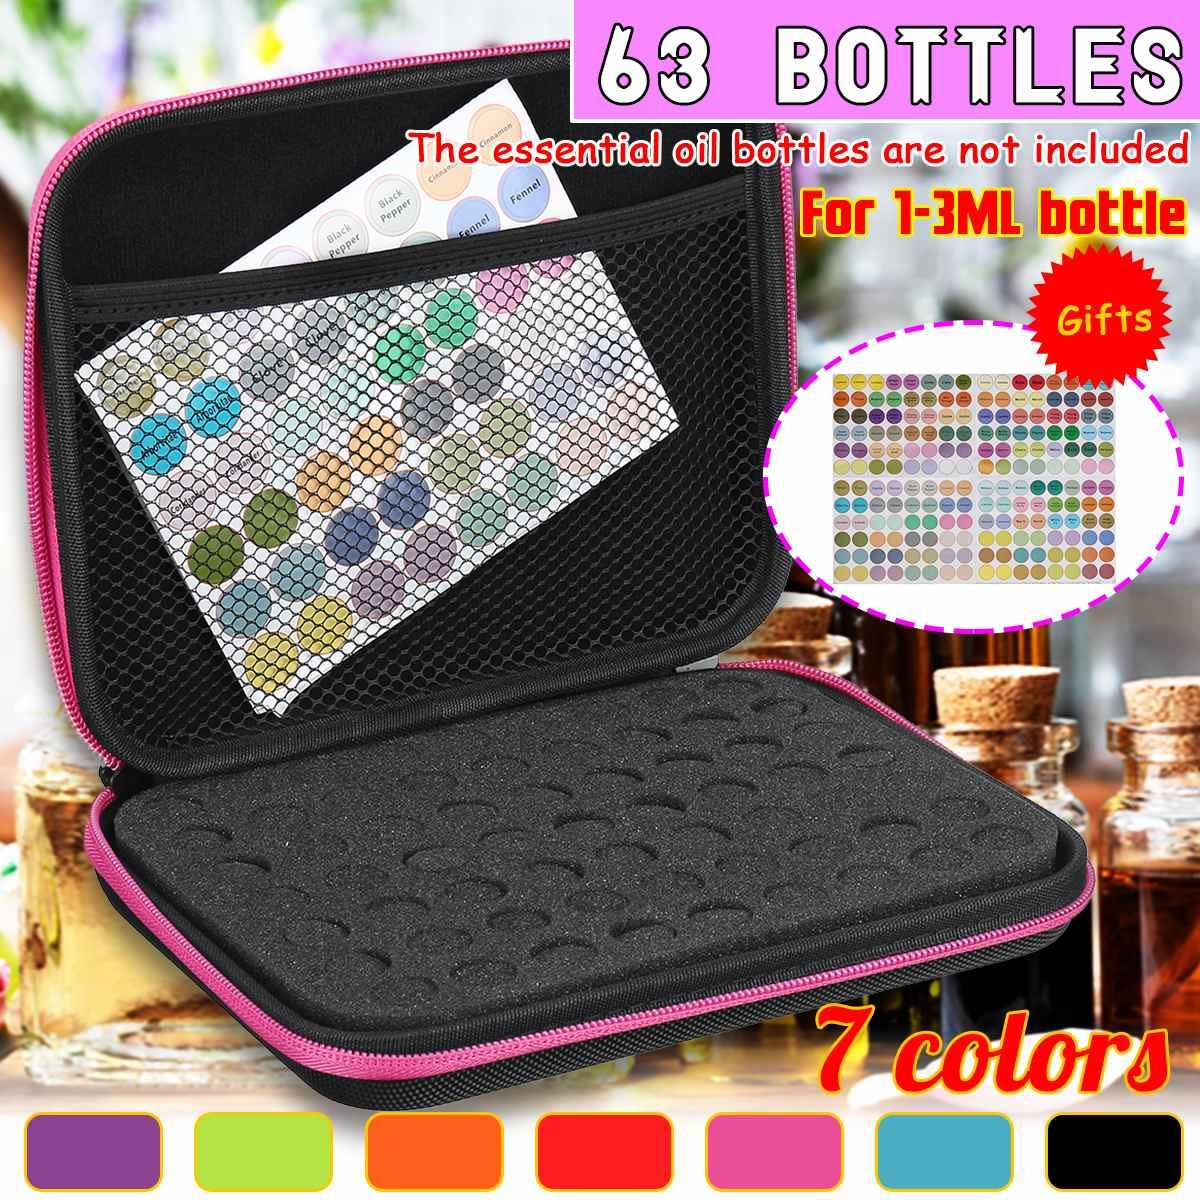 Essential Oil Storage Bag 63 Bottles EVA For 1-3 Ml Essence Oil Bottles Box Carrying Case Travel Home Portable Handbag Organizer